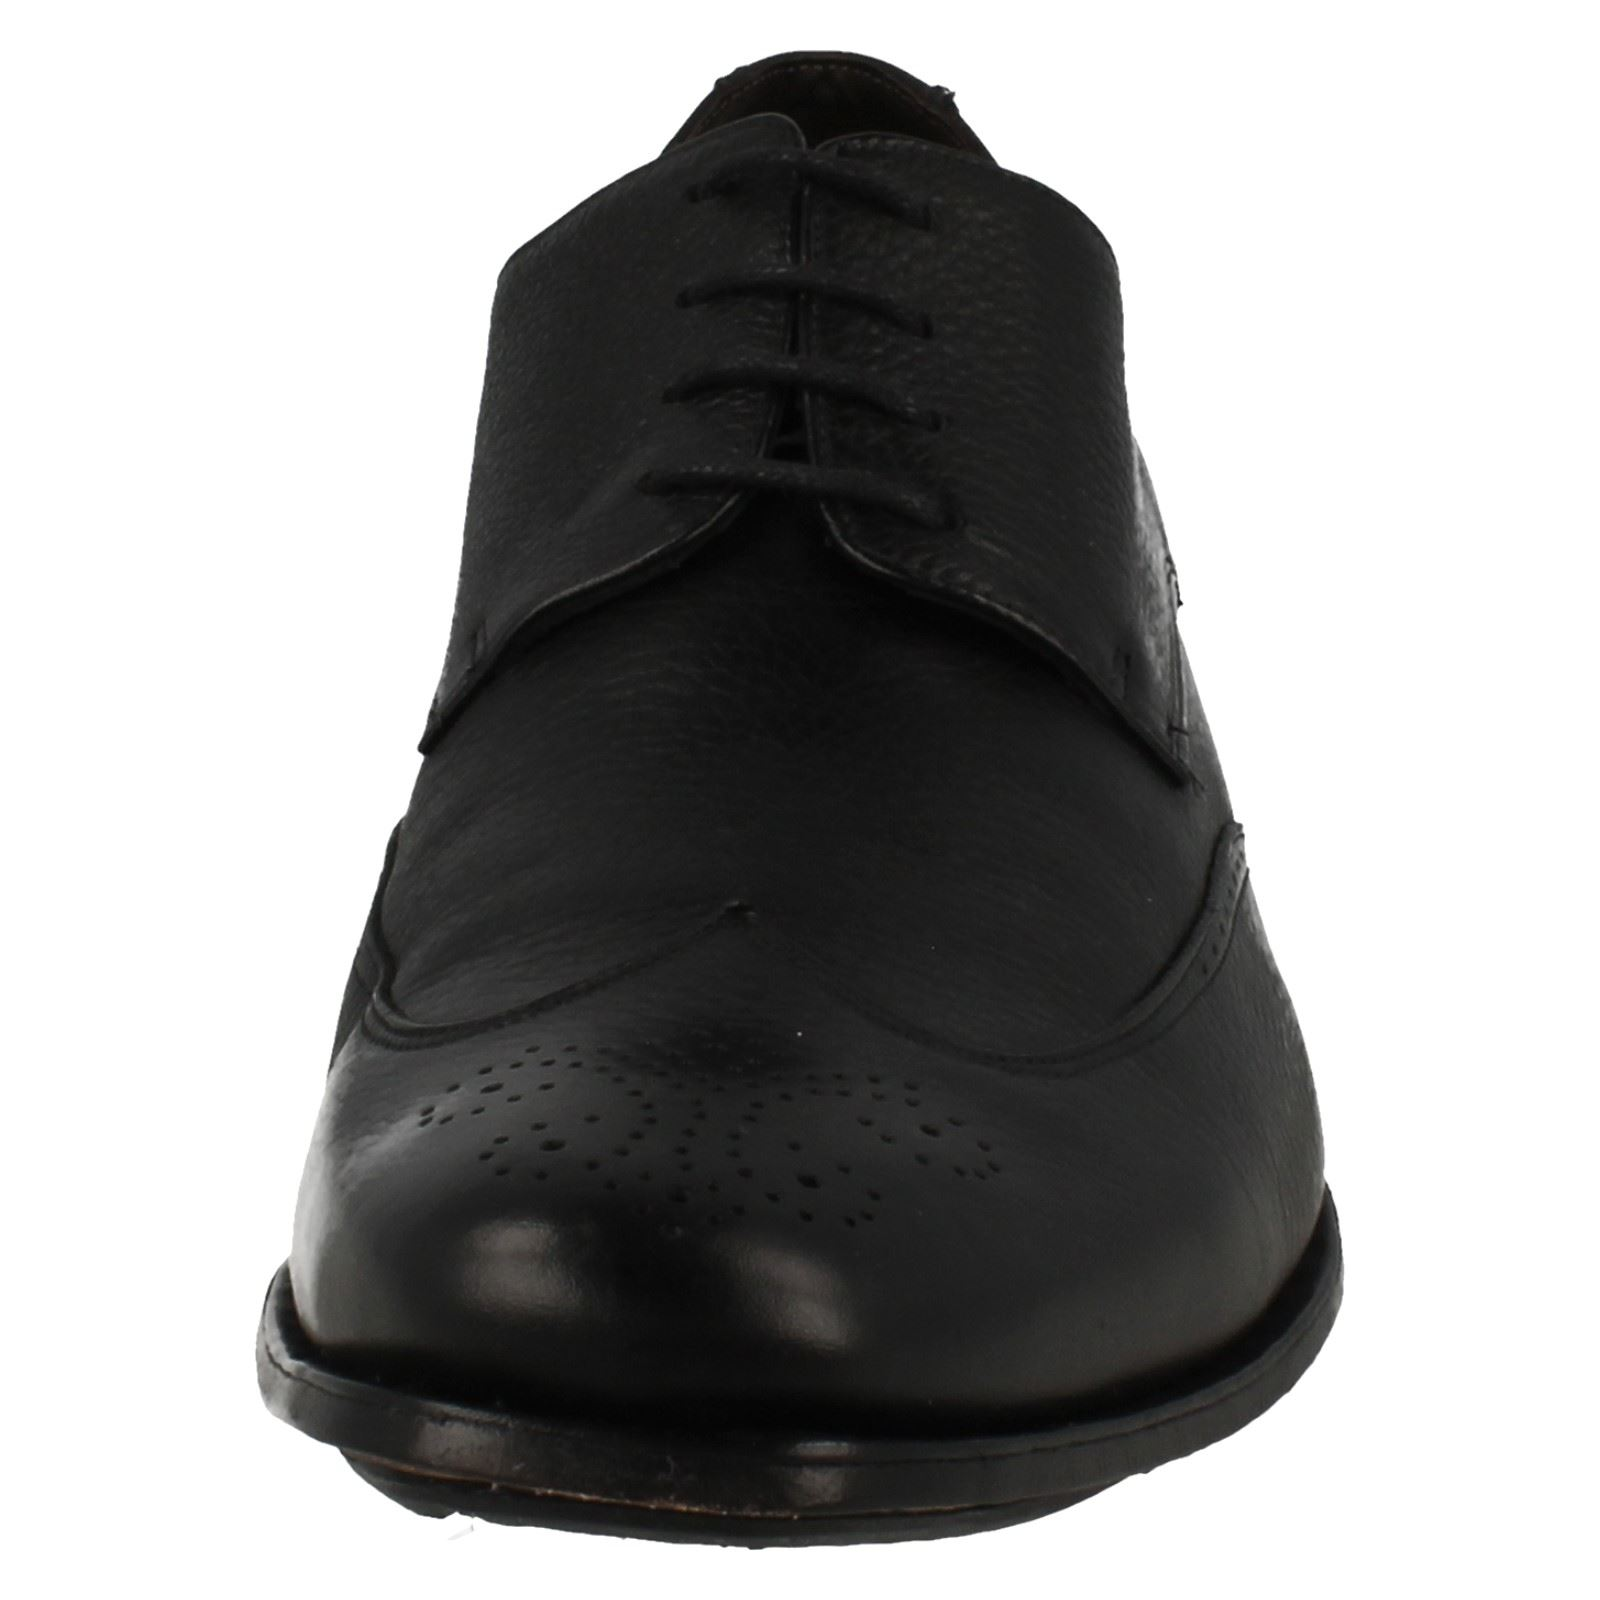 ' Hommes Chaussures Anatomic Prime Smart Guara Formelles ffv4q8xwS